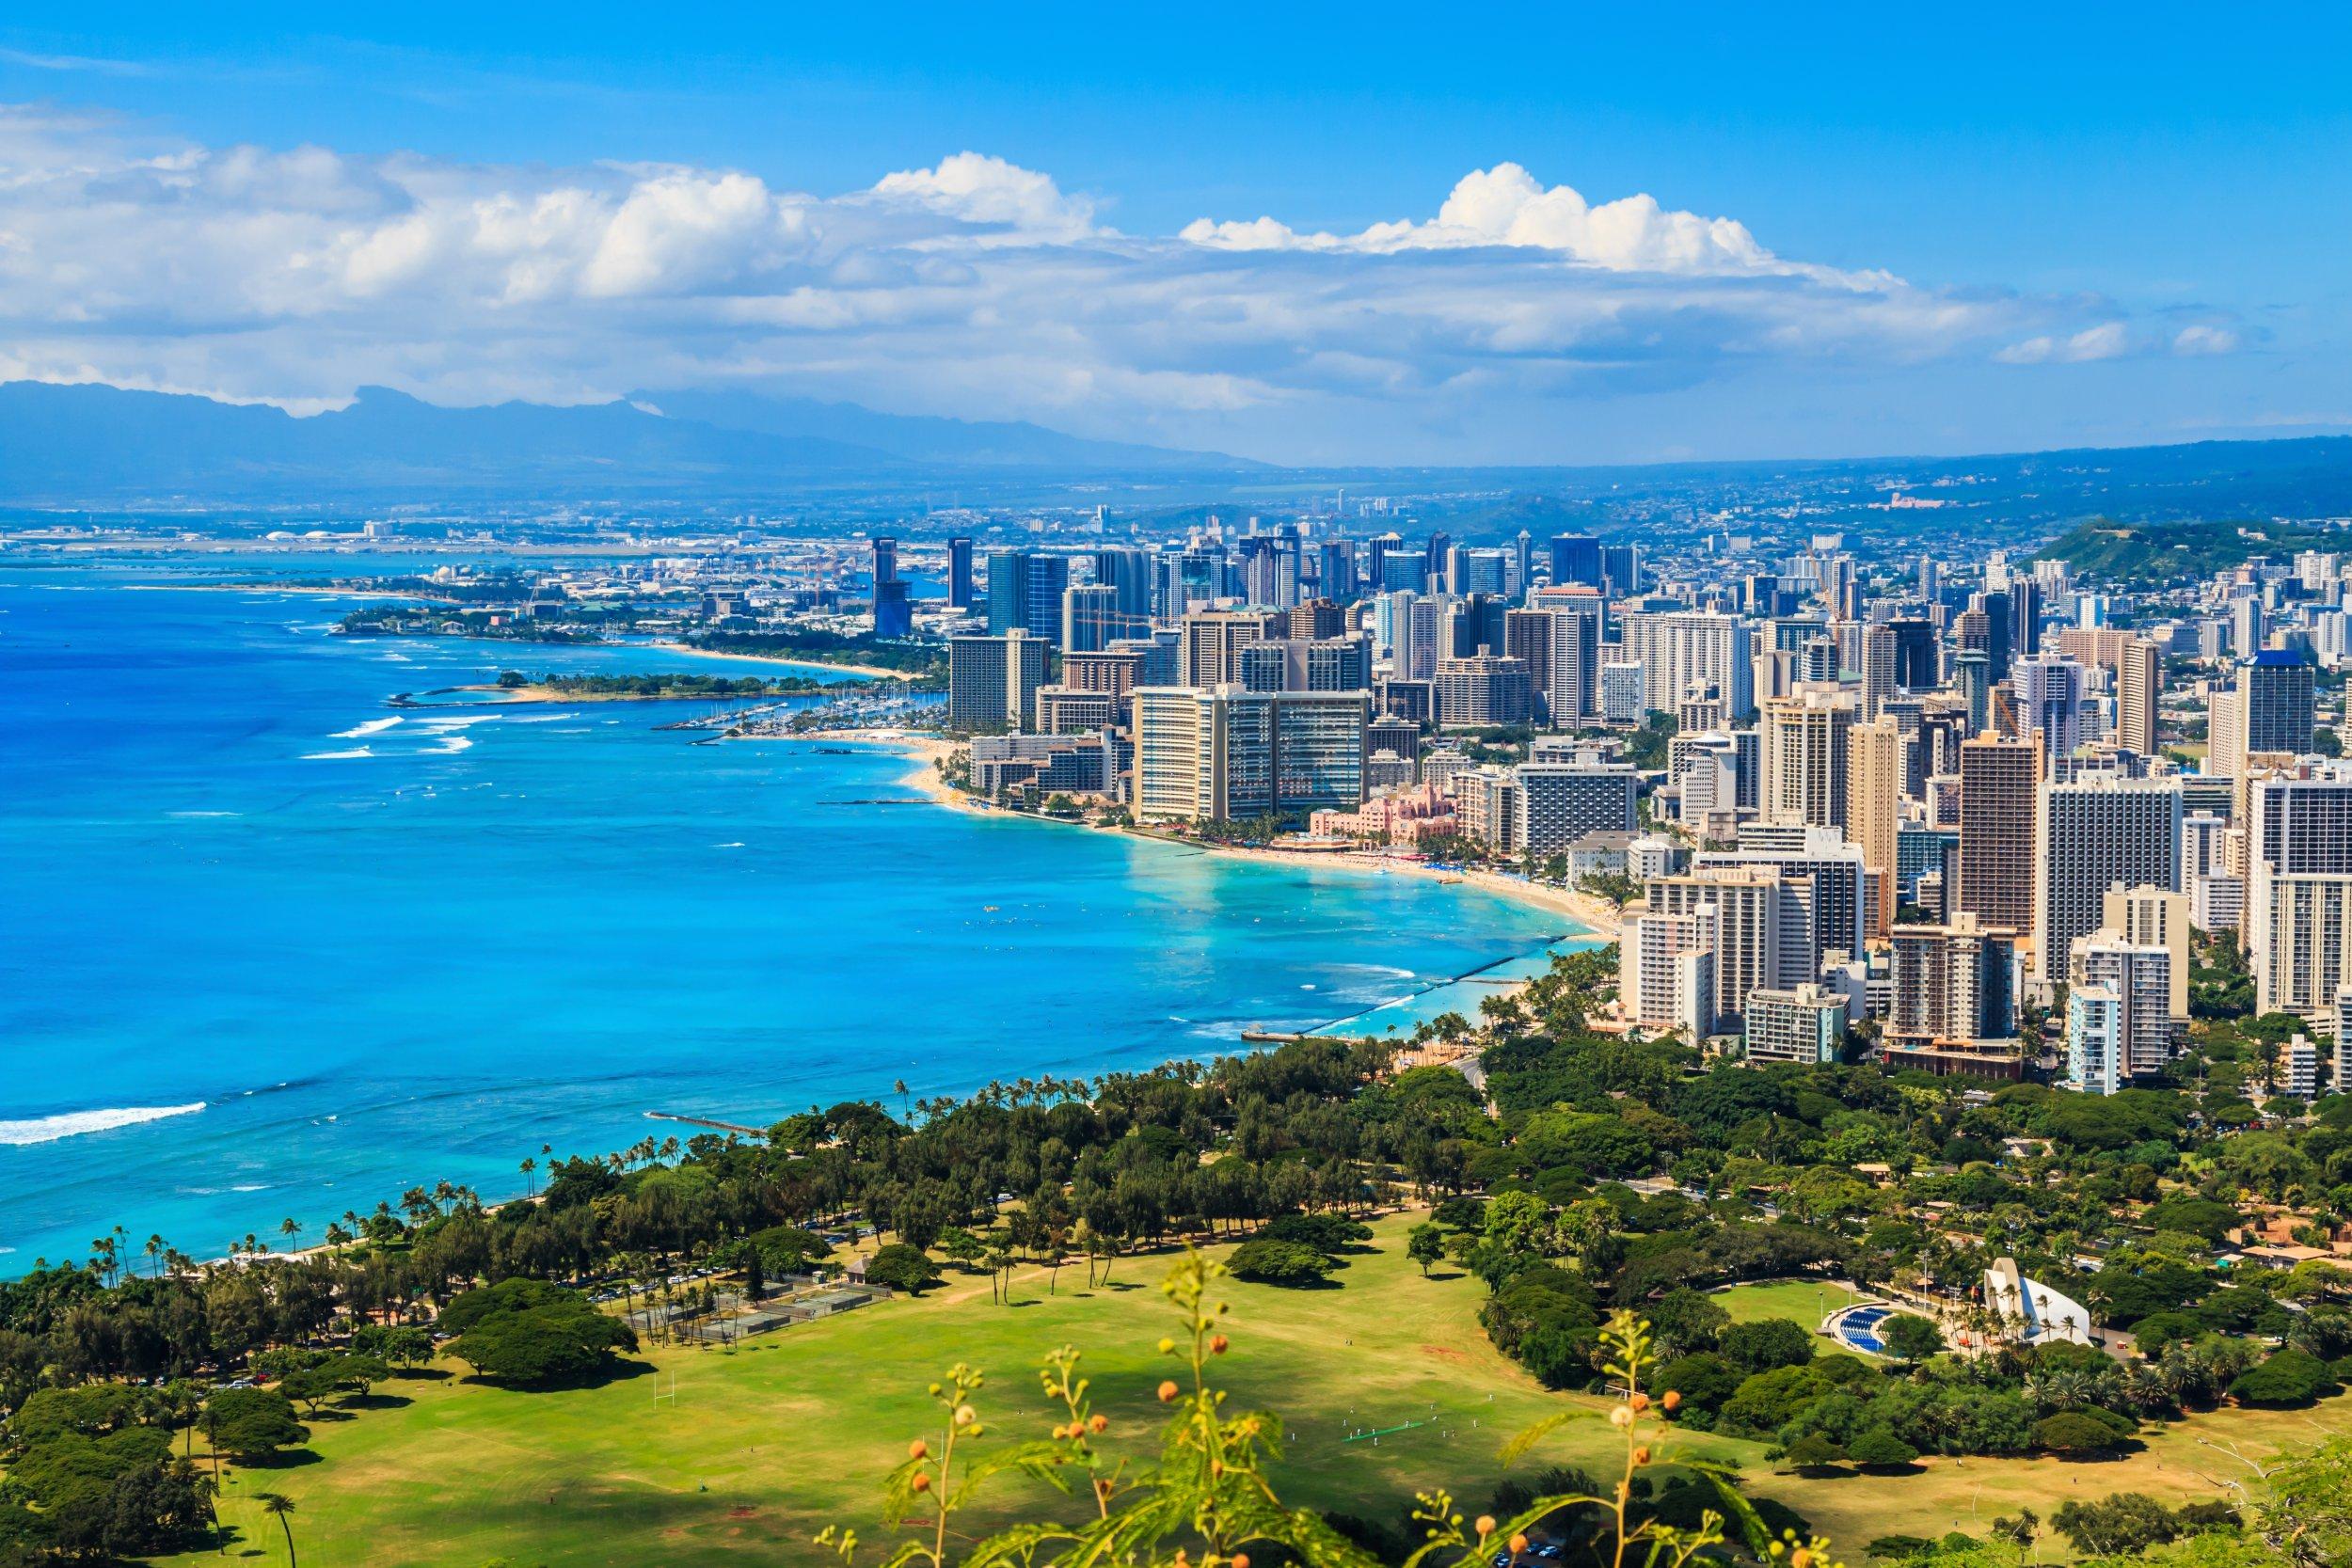 8A Honolulu